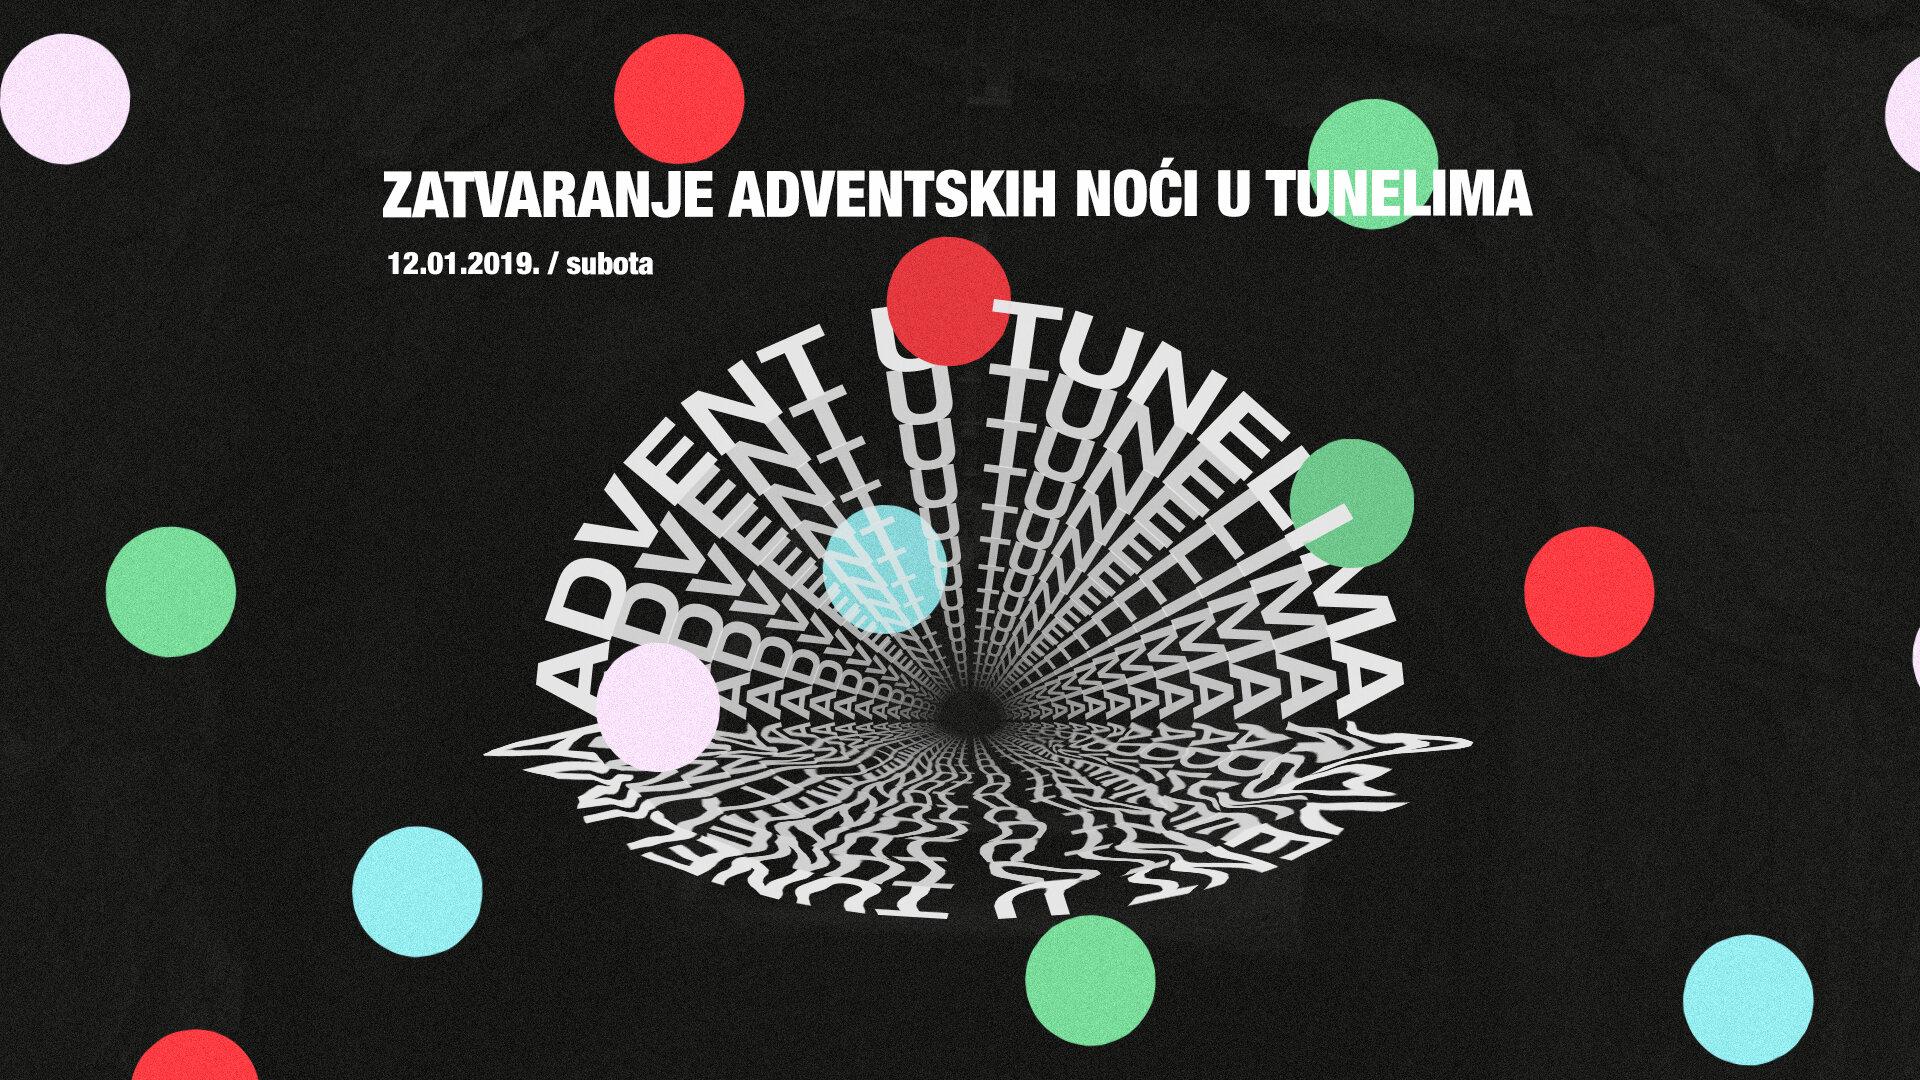 tunel-advent-zatvaranje-adventa.jpg